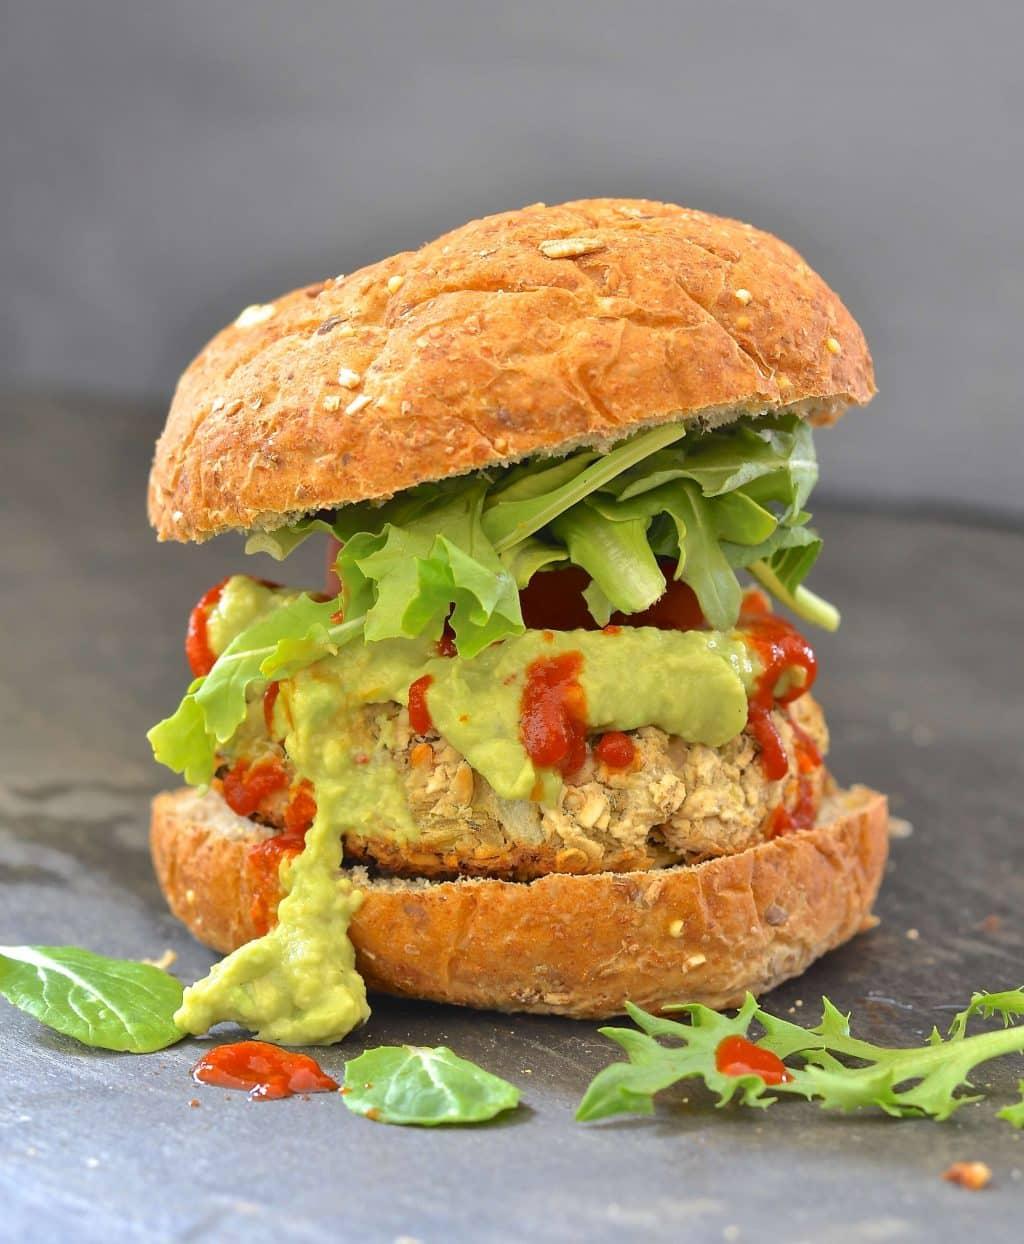 a whte bean artichoke burger in a wholewheta bun with lettuce, guacamole and hot sauce